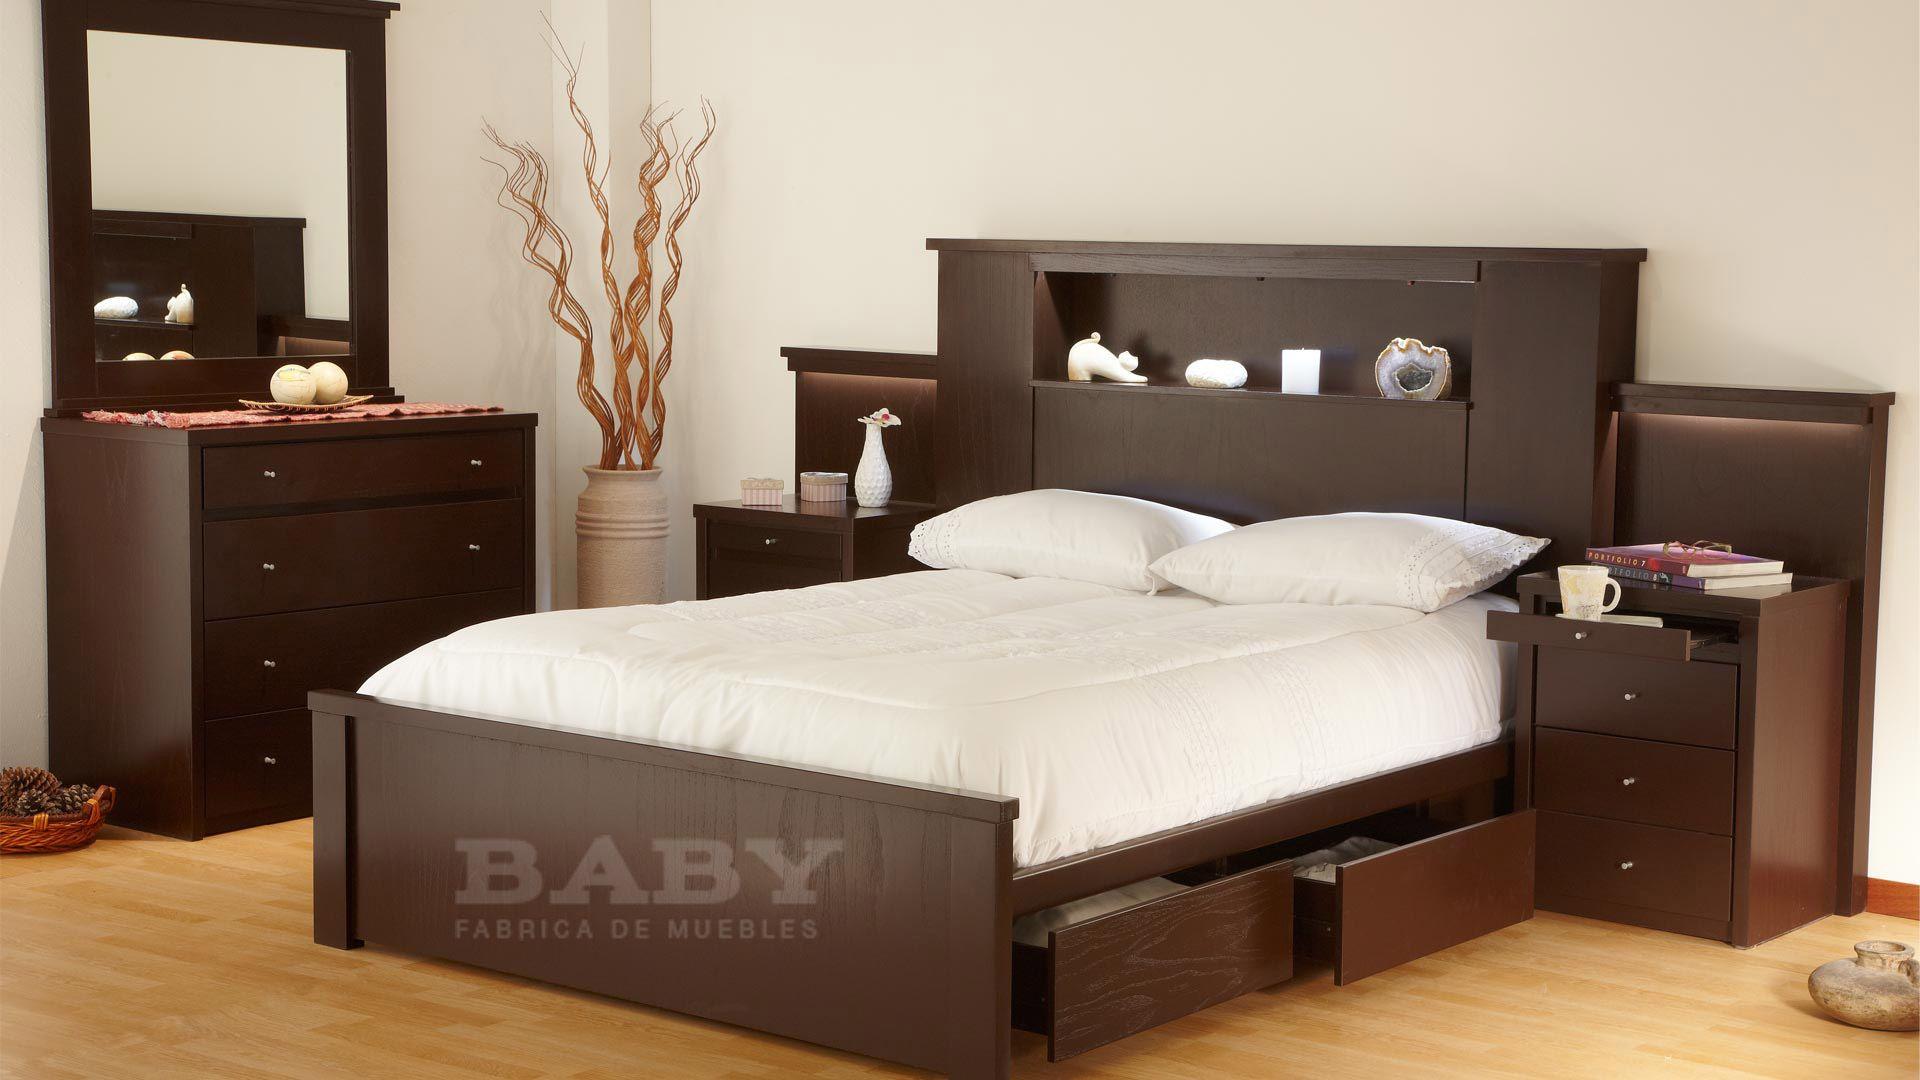 Juego De Dormitorio Camila01 Jpg 1920 1080 Furniture Home Decor Storage Bed